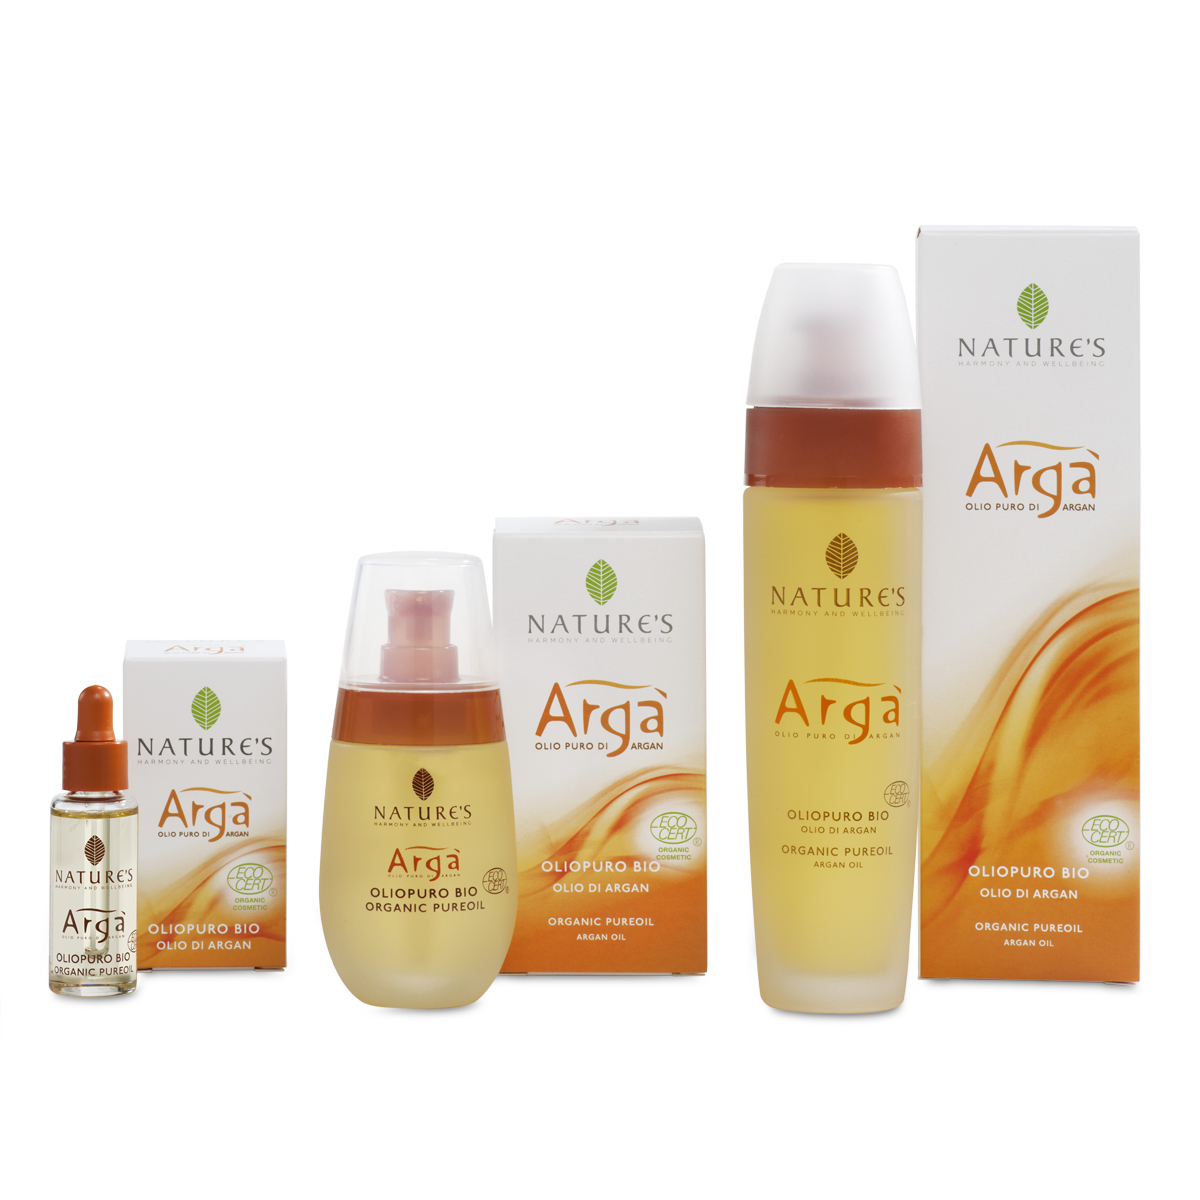 Olio Puro di Argan Bio certificato Ecocert GreenLife